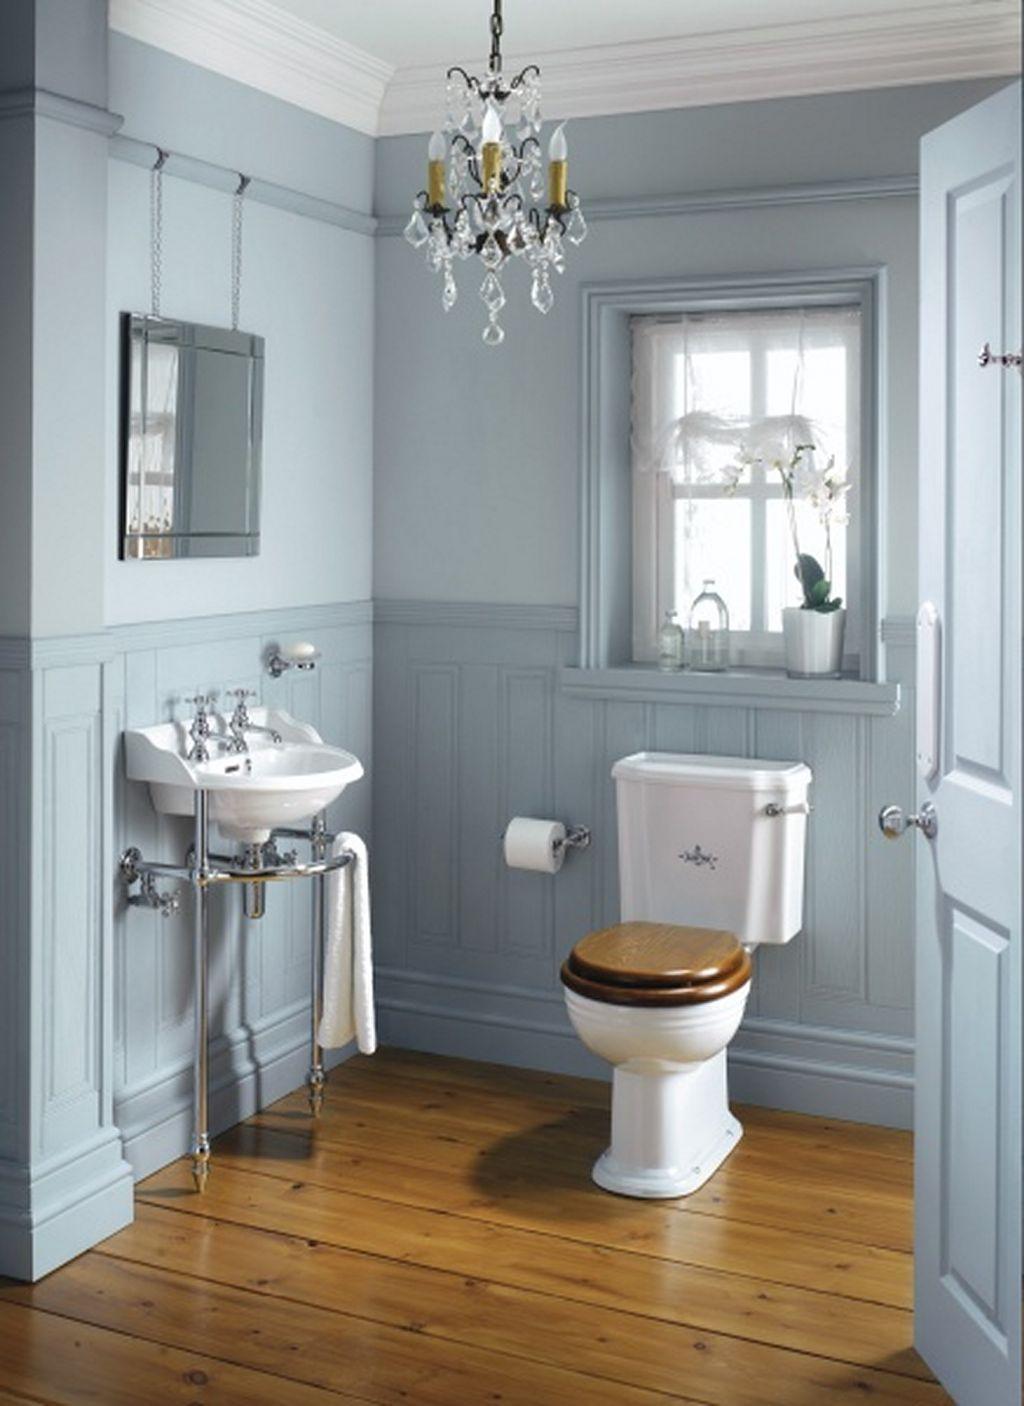 Beautiful Bathroom Ideas Bathroom Styling Bathroom Interior Traditional Bathroom Victorian bathroom design ideas